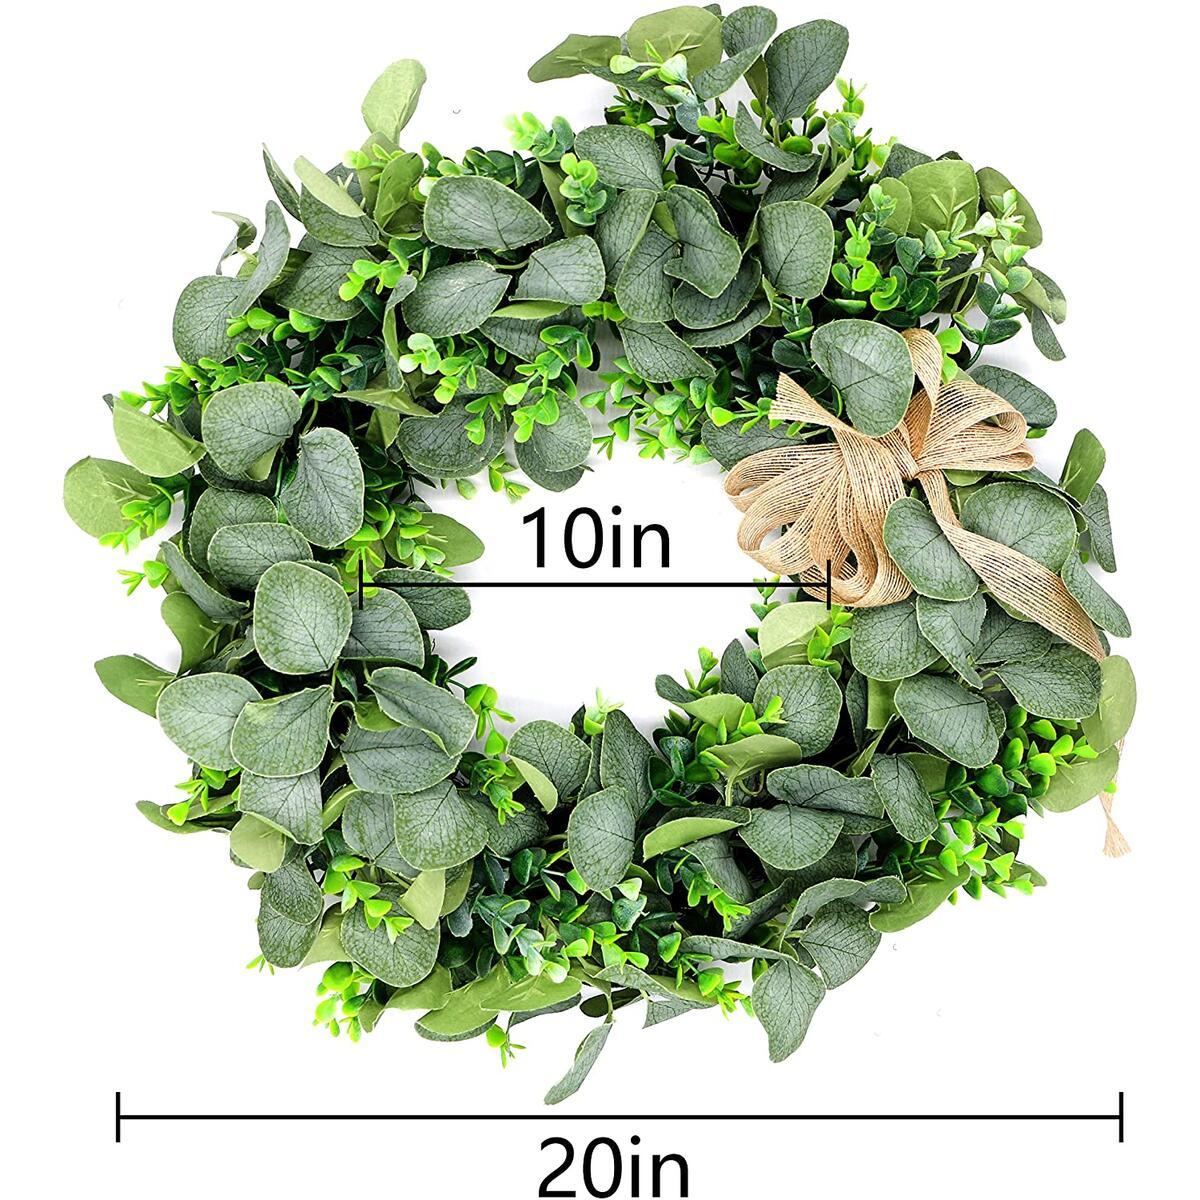 Eucalyptus Wreath, 20Inch Summer Wreaths for Front Door Farmhouse, Greenery Wreath